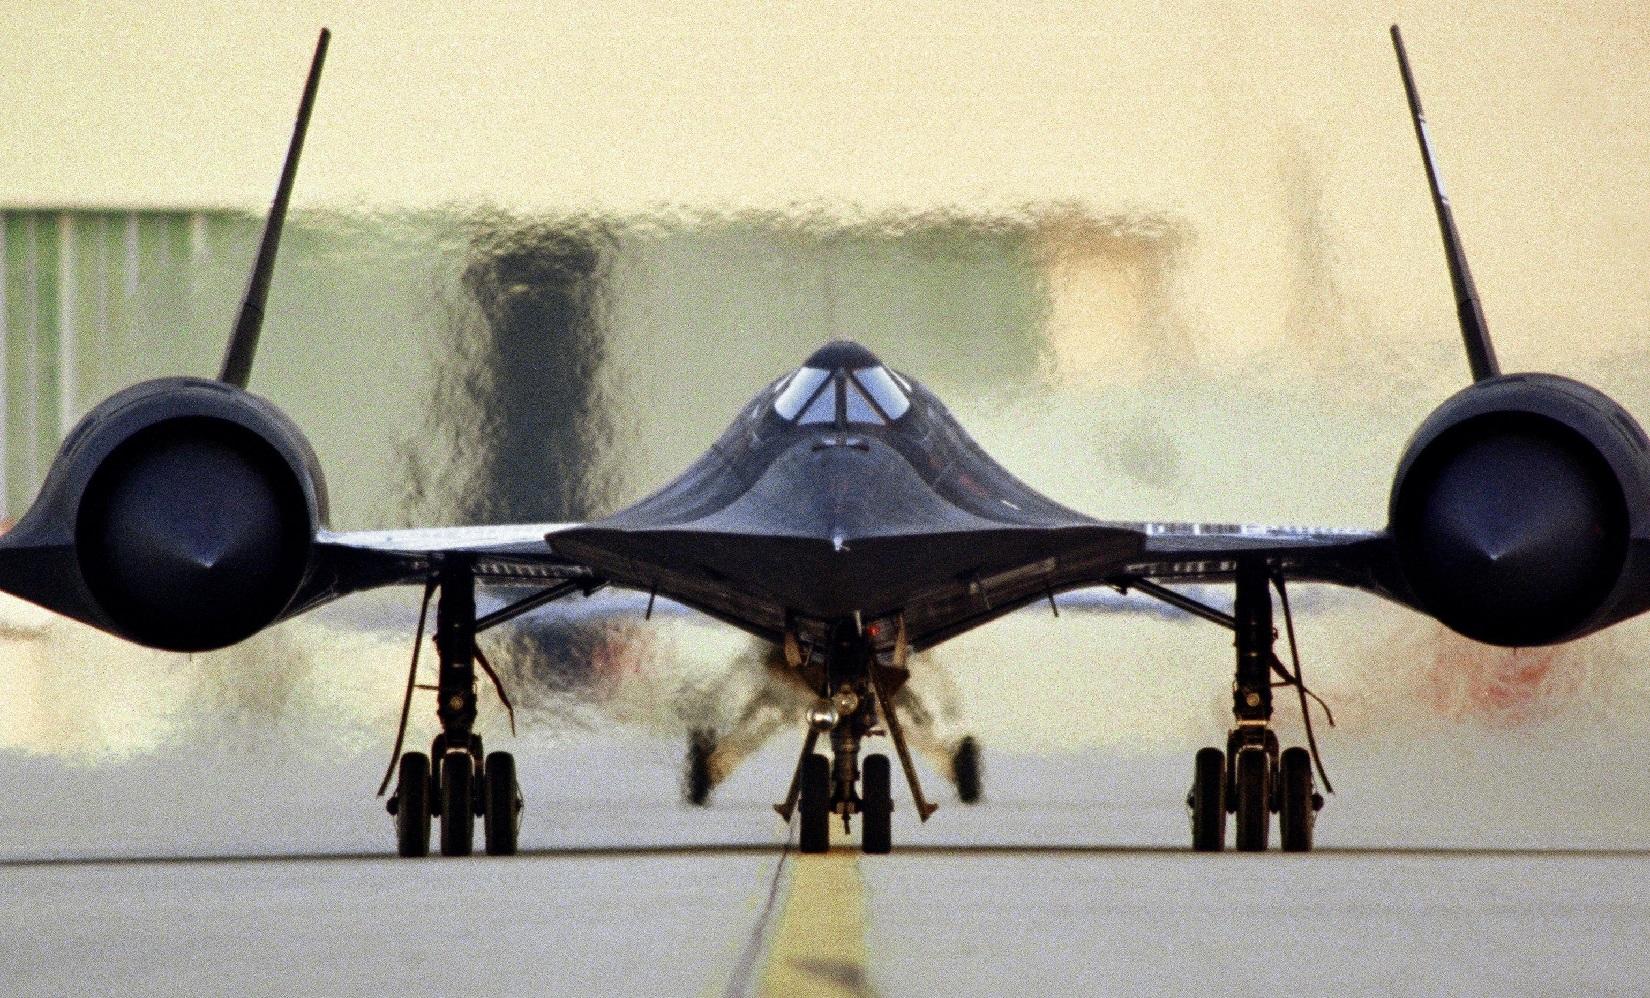 When North Korea Tried to Shoot Down a Mach 3 SR-71 Spy Plane (And Failed)